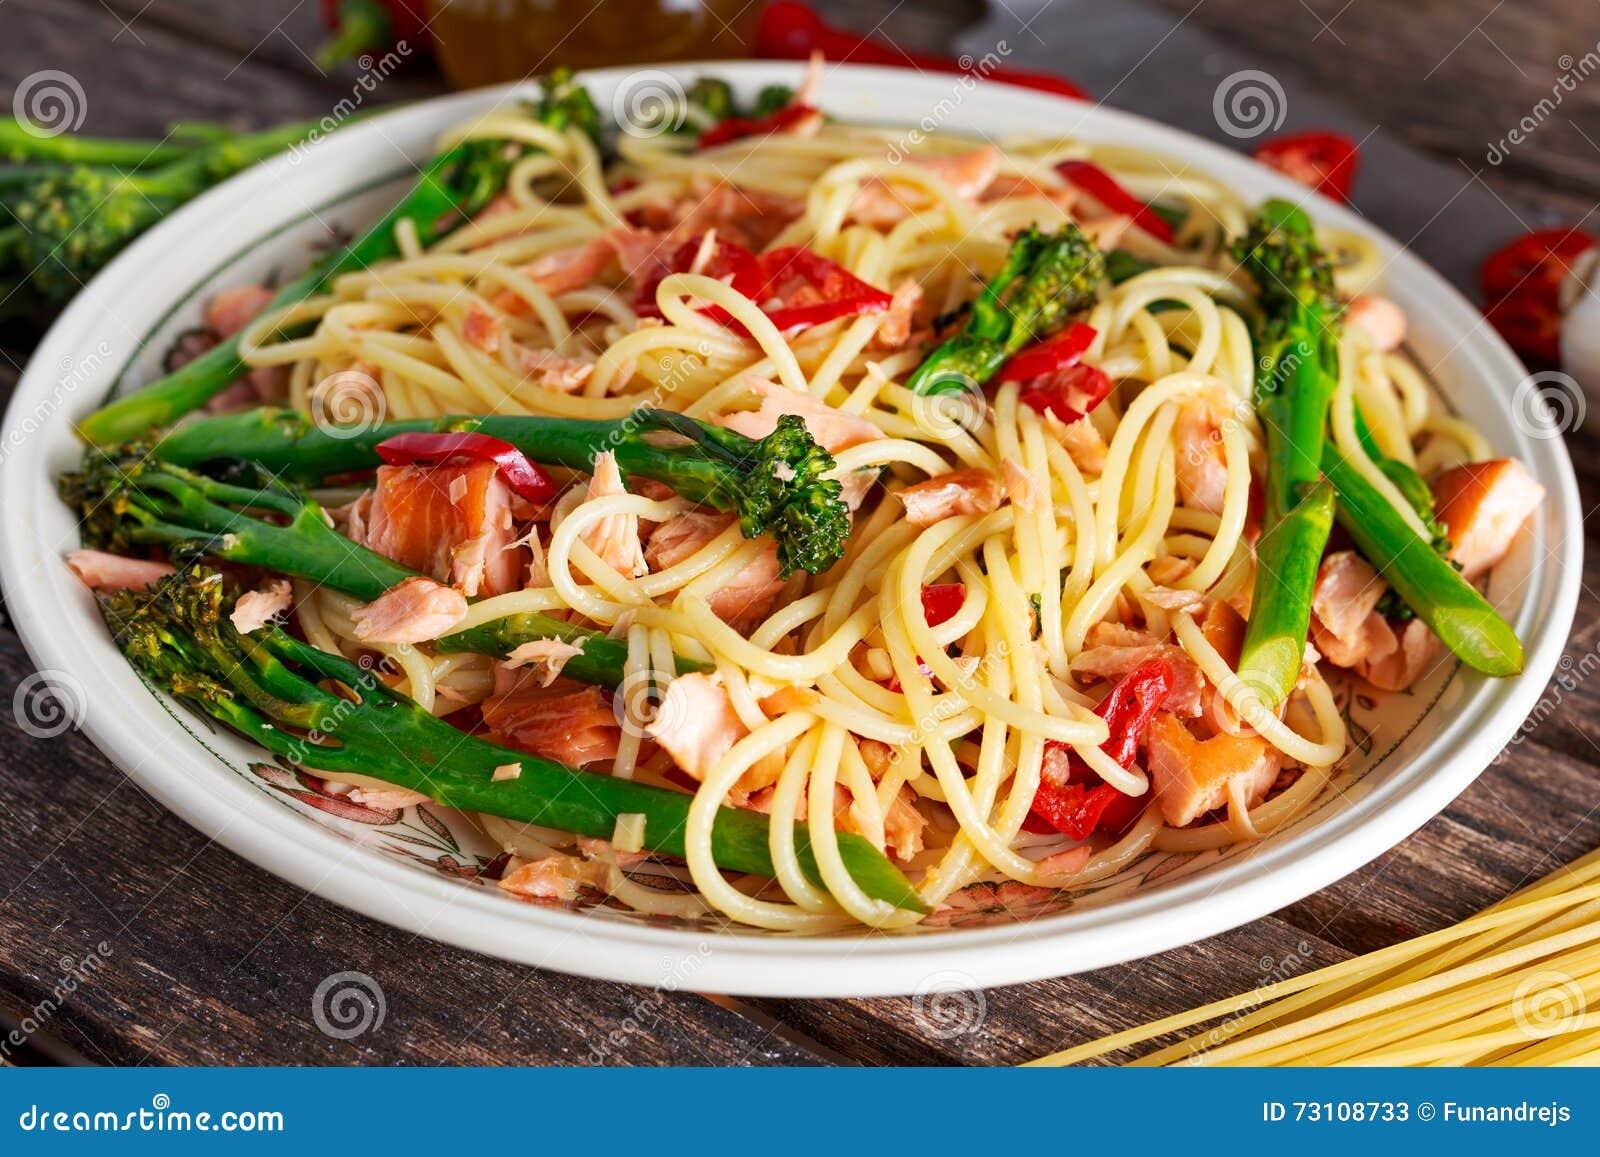 Pasta Spaghetti With Smoked Salmon Chilli And Broccoli Stock Photos